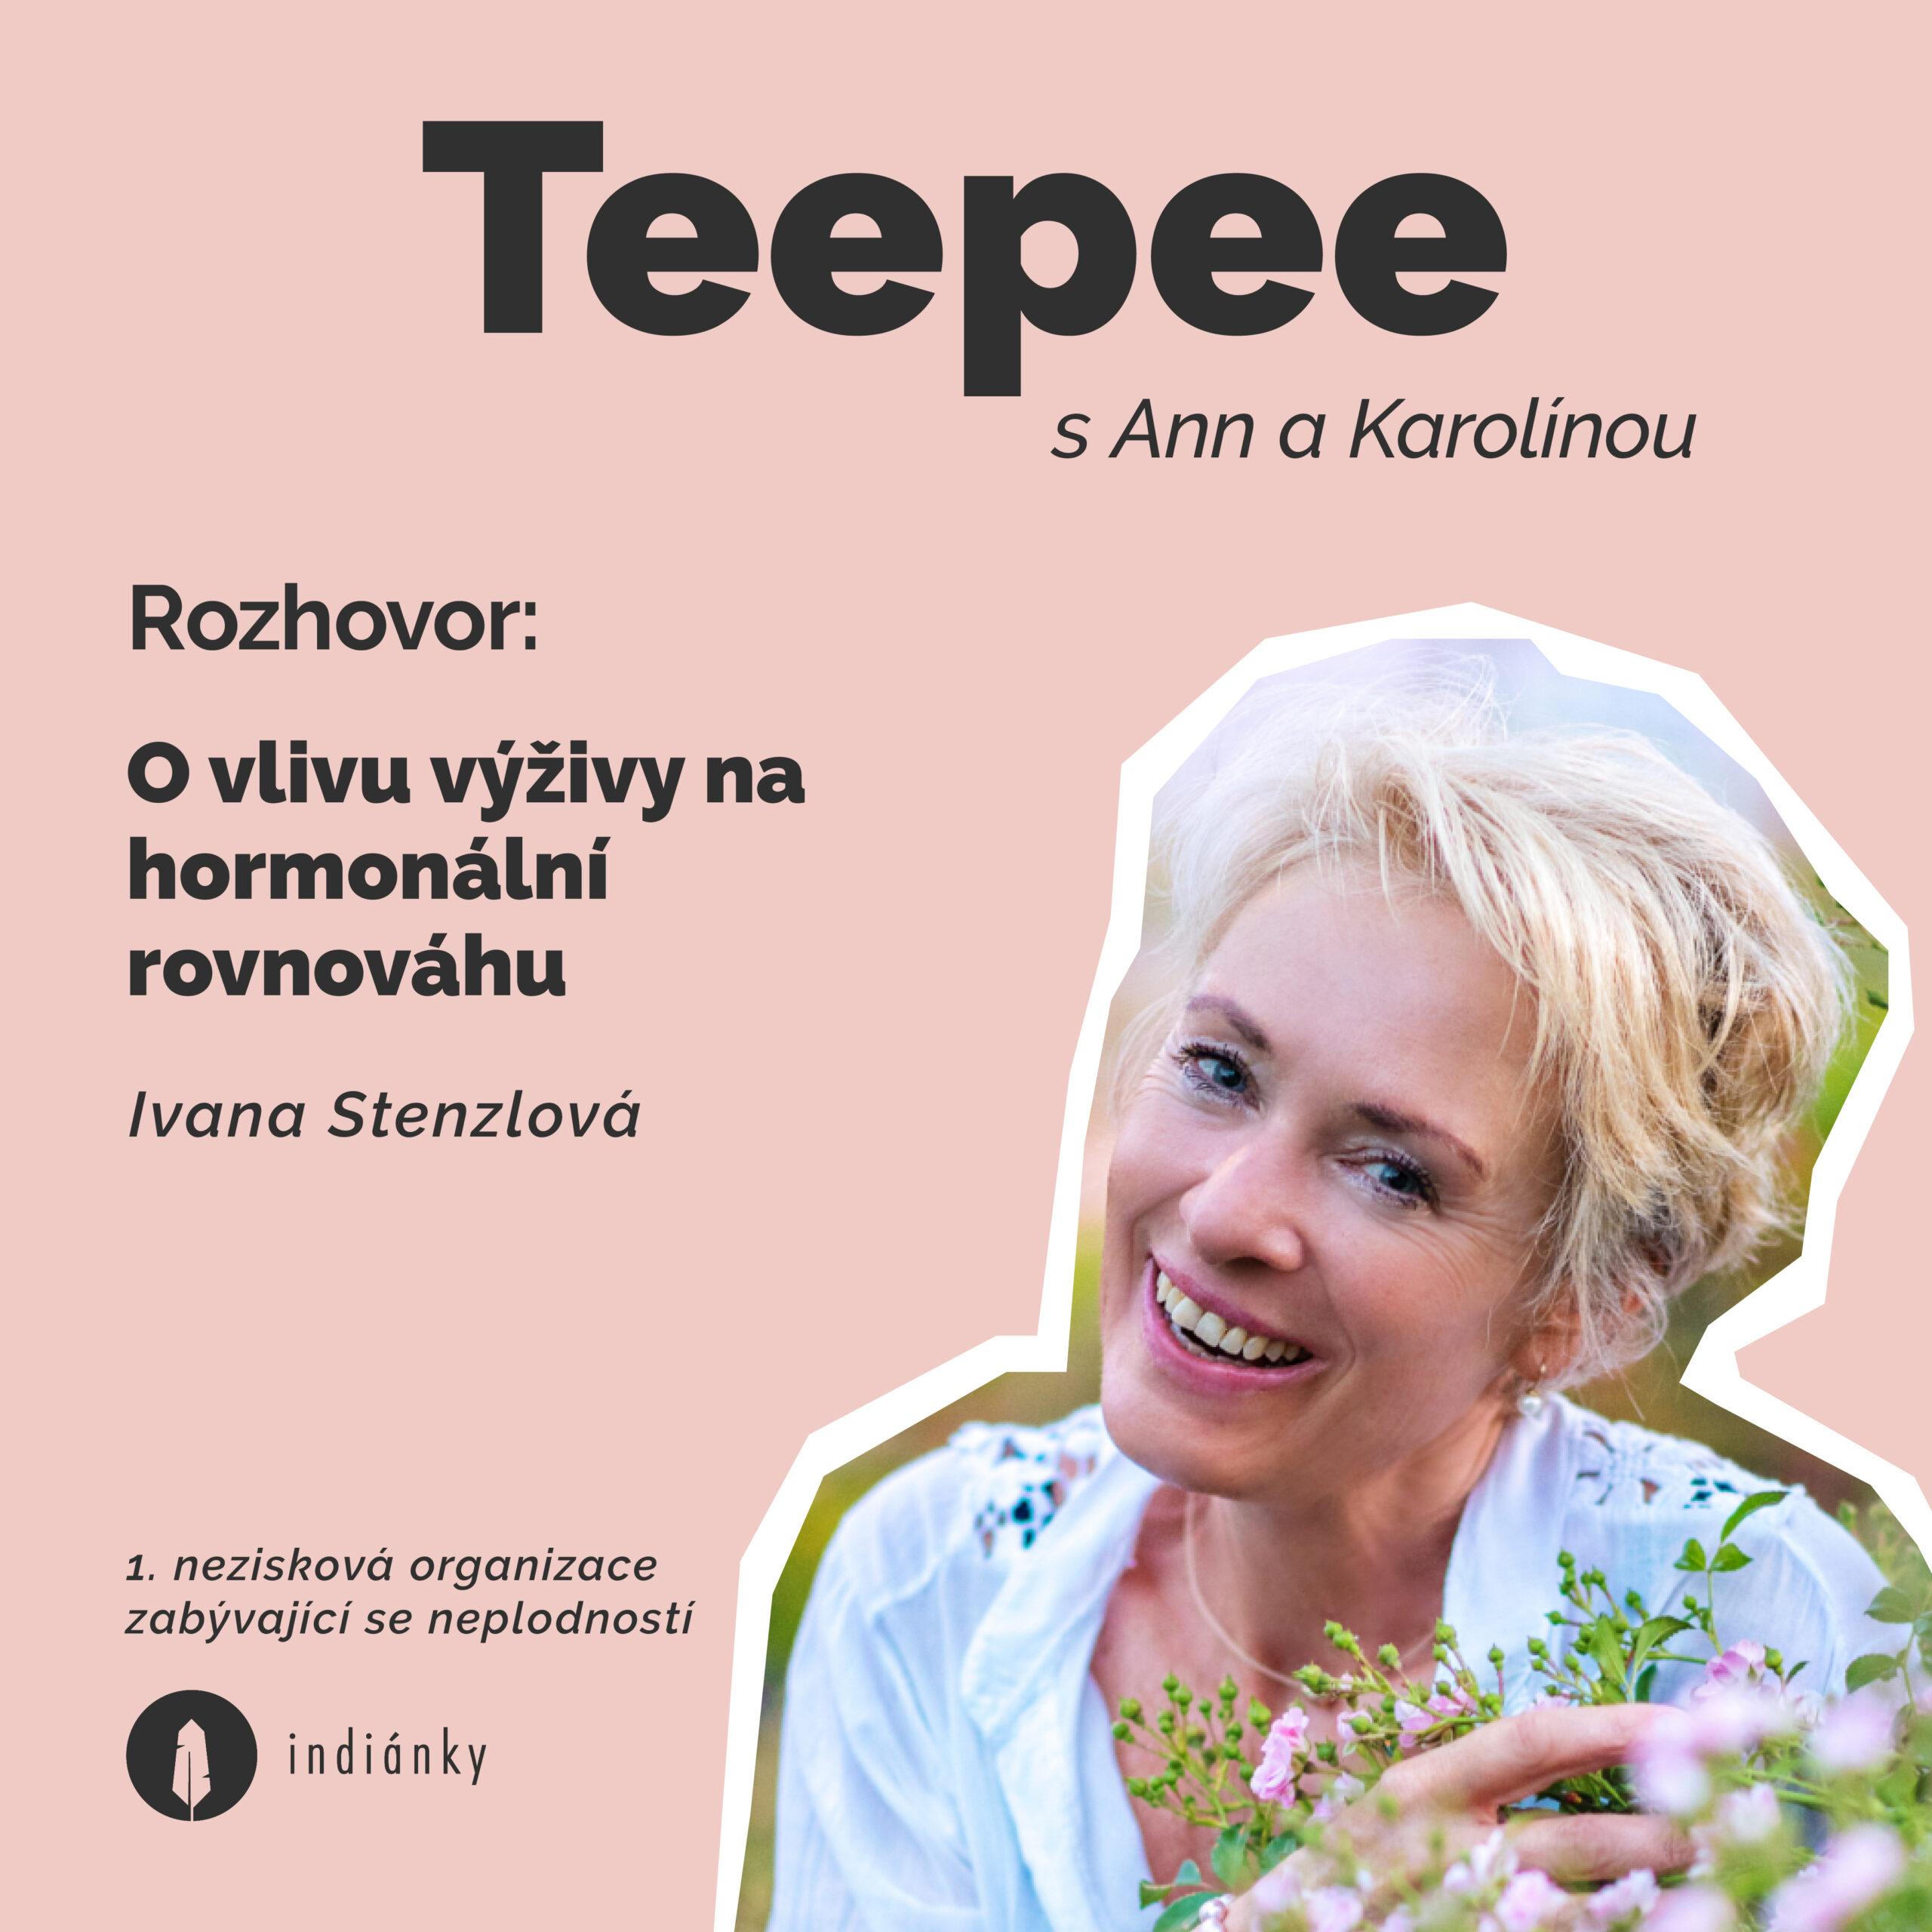 Video: #6 Teepee: O vlivu výživy na hormonální rovnováhu s Ivanou Stenzlovou